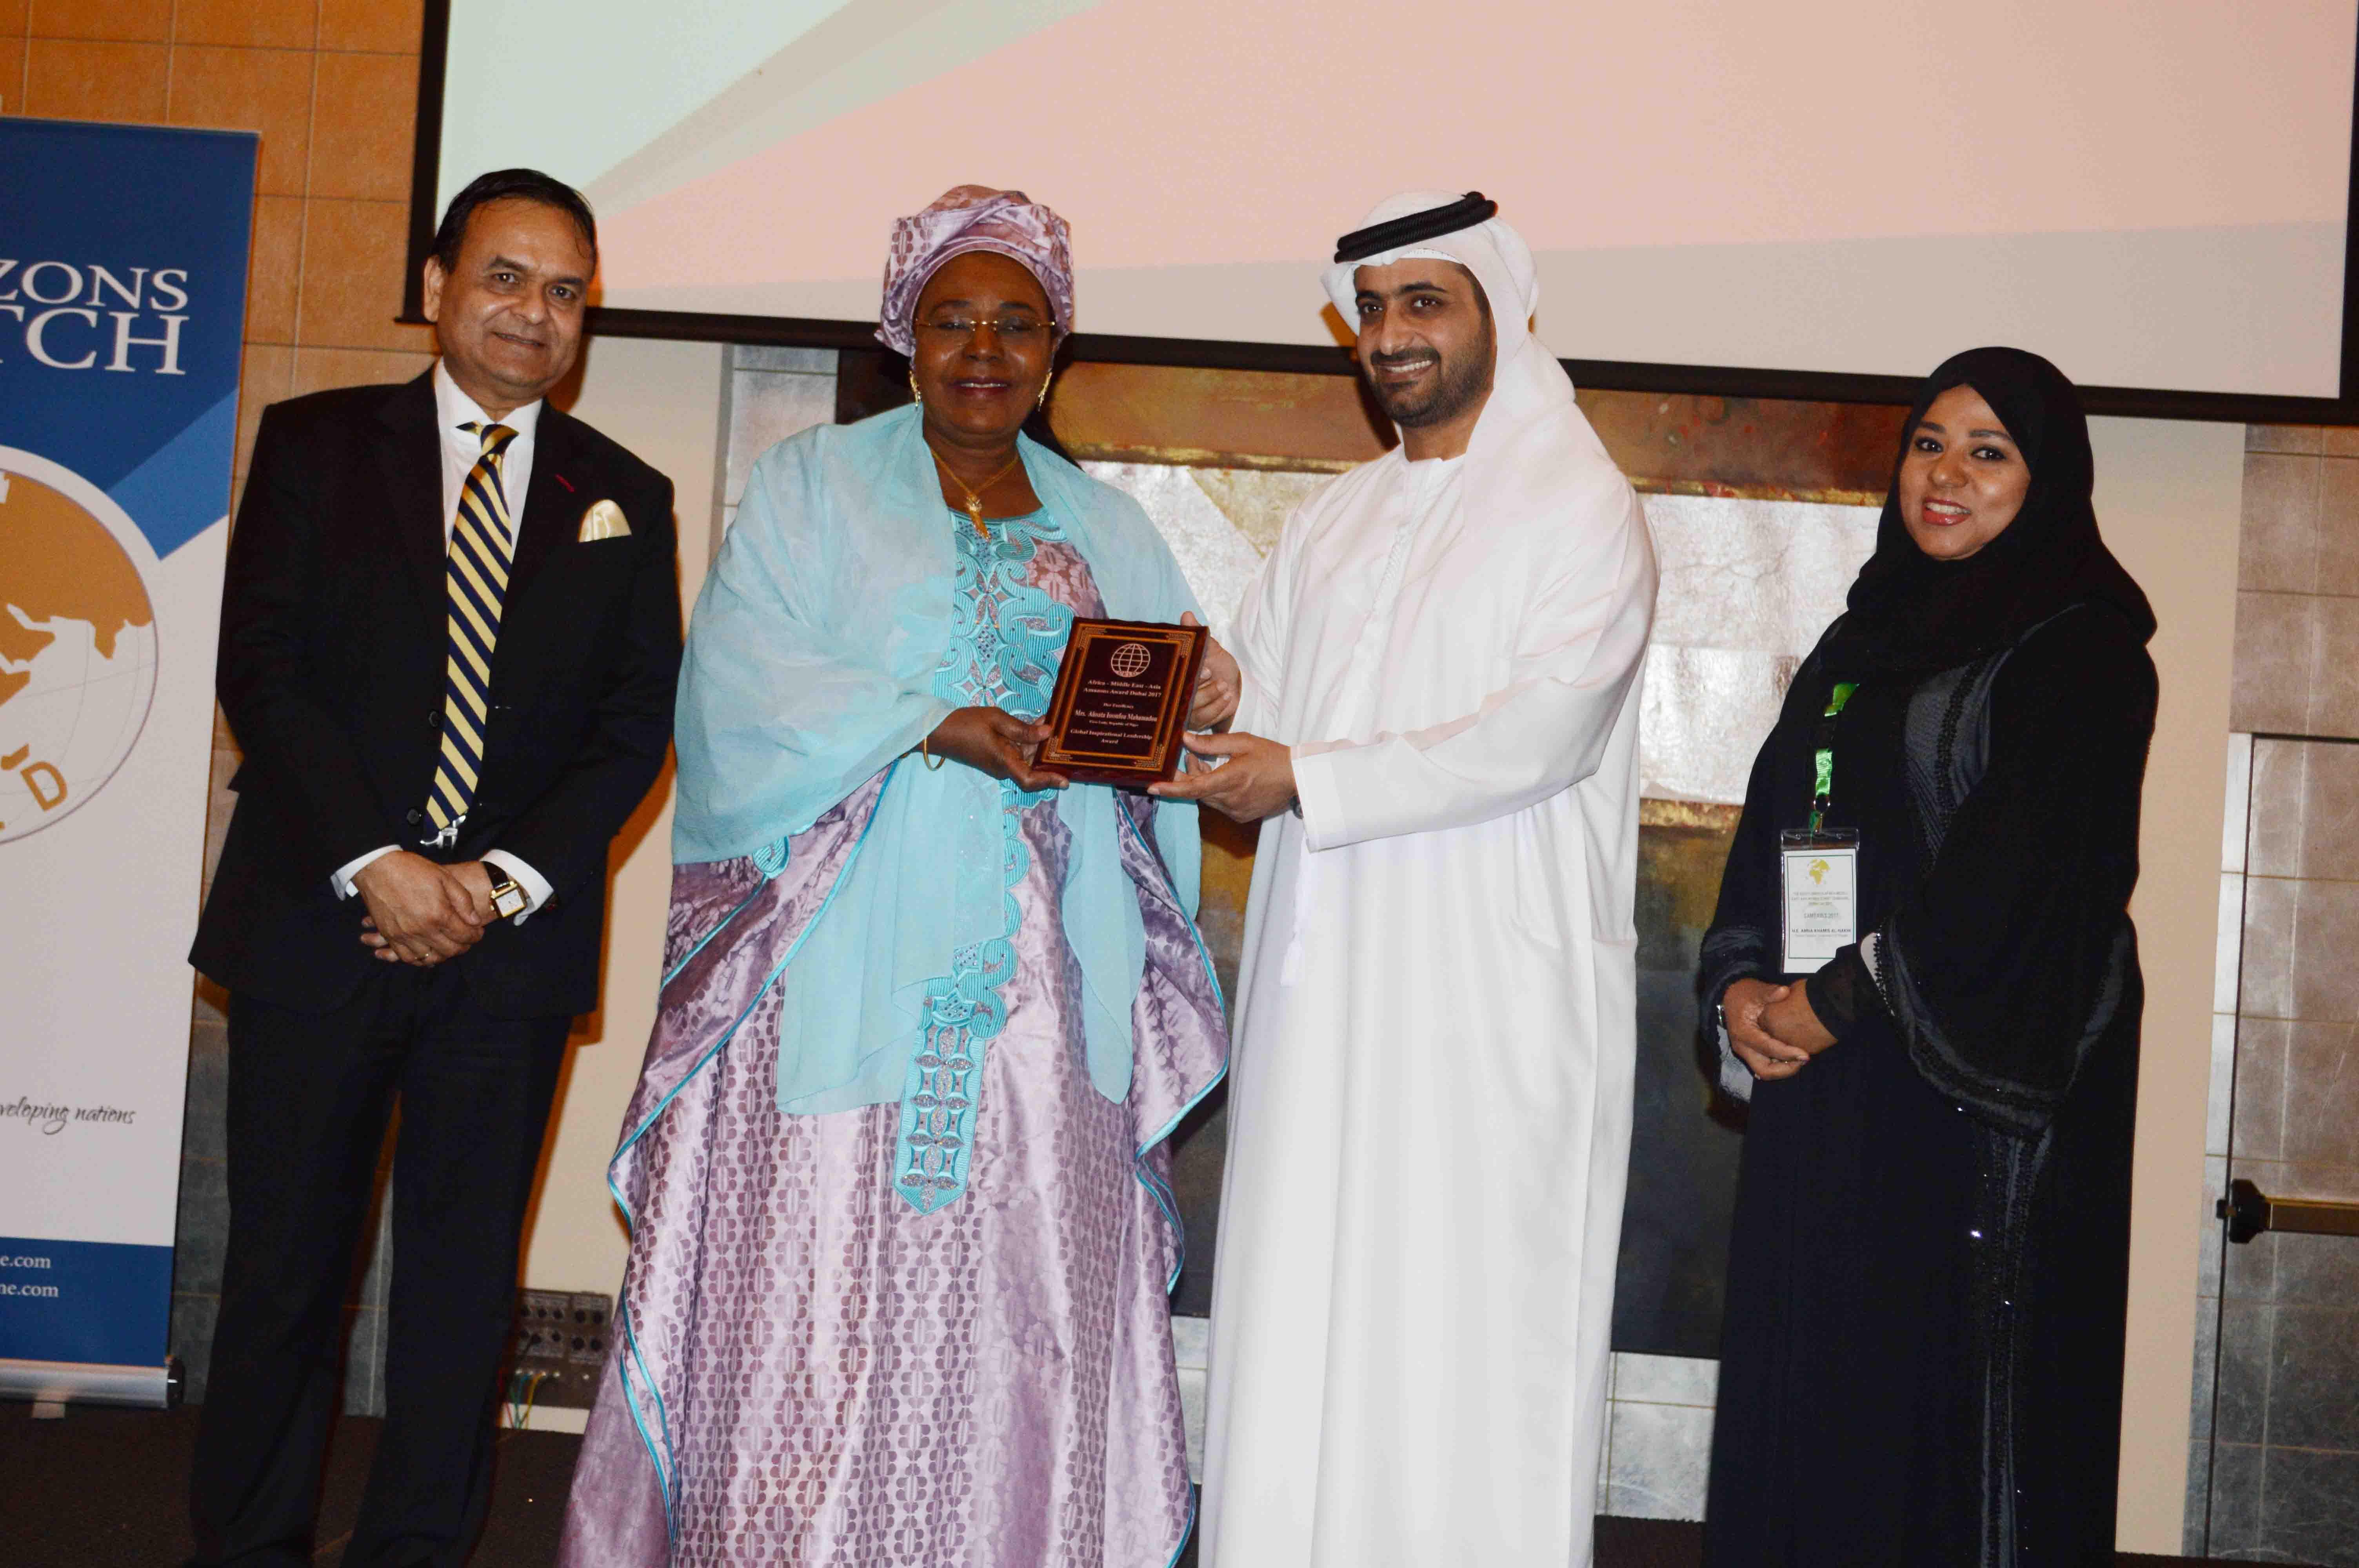 H.E. Aissata Mohammadu Issoufou receiving CELD's Global Female Inspirational Leadership Award during SAMEAWS 2017